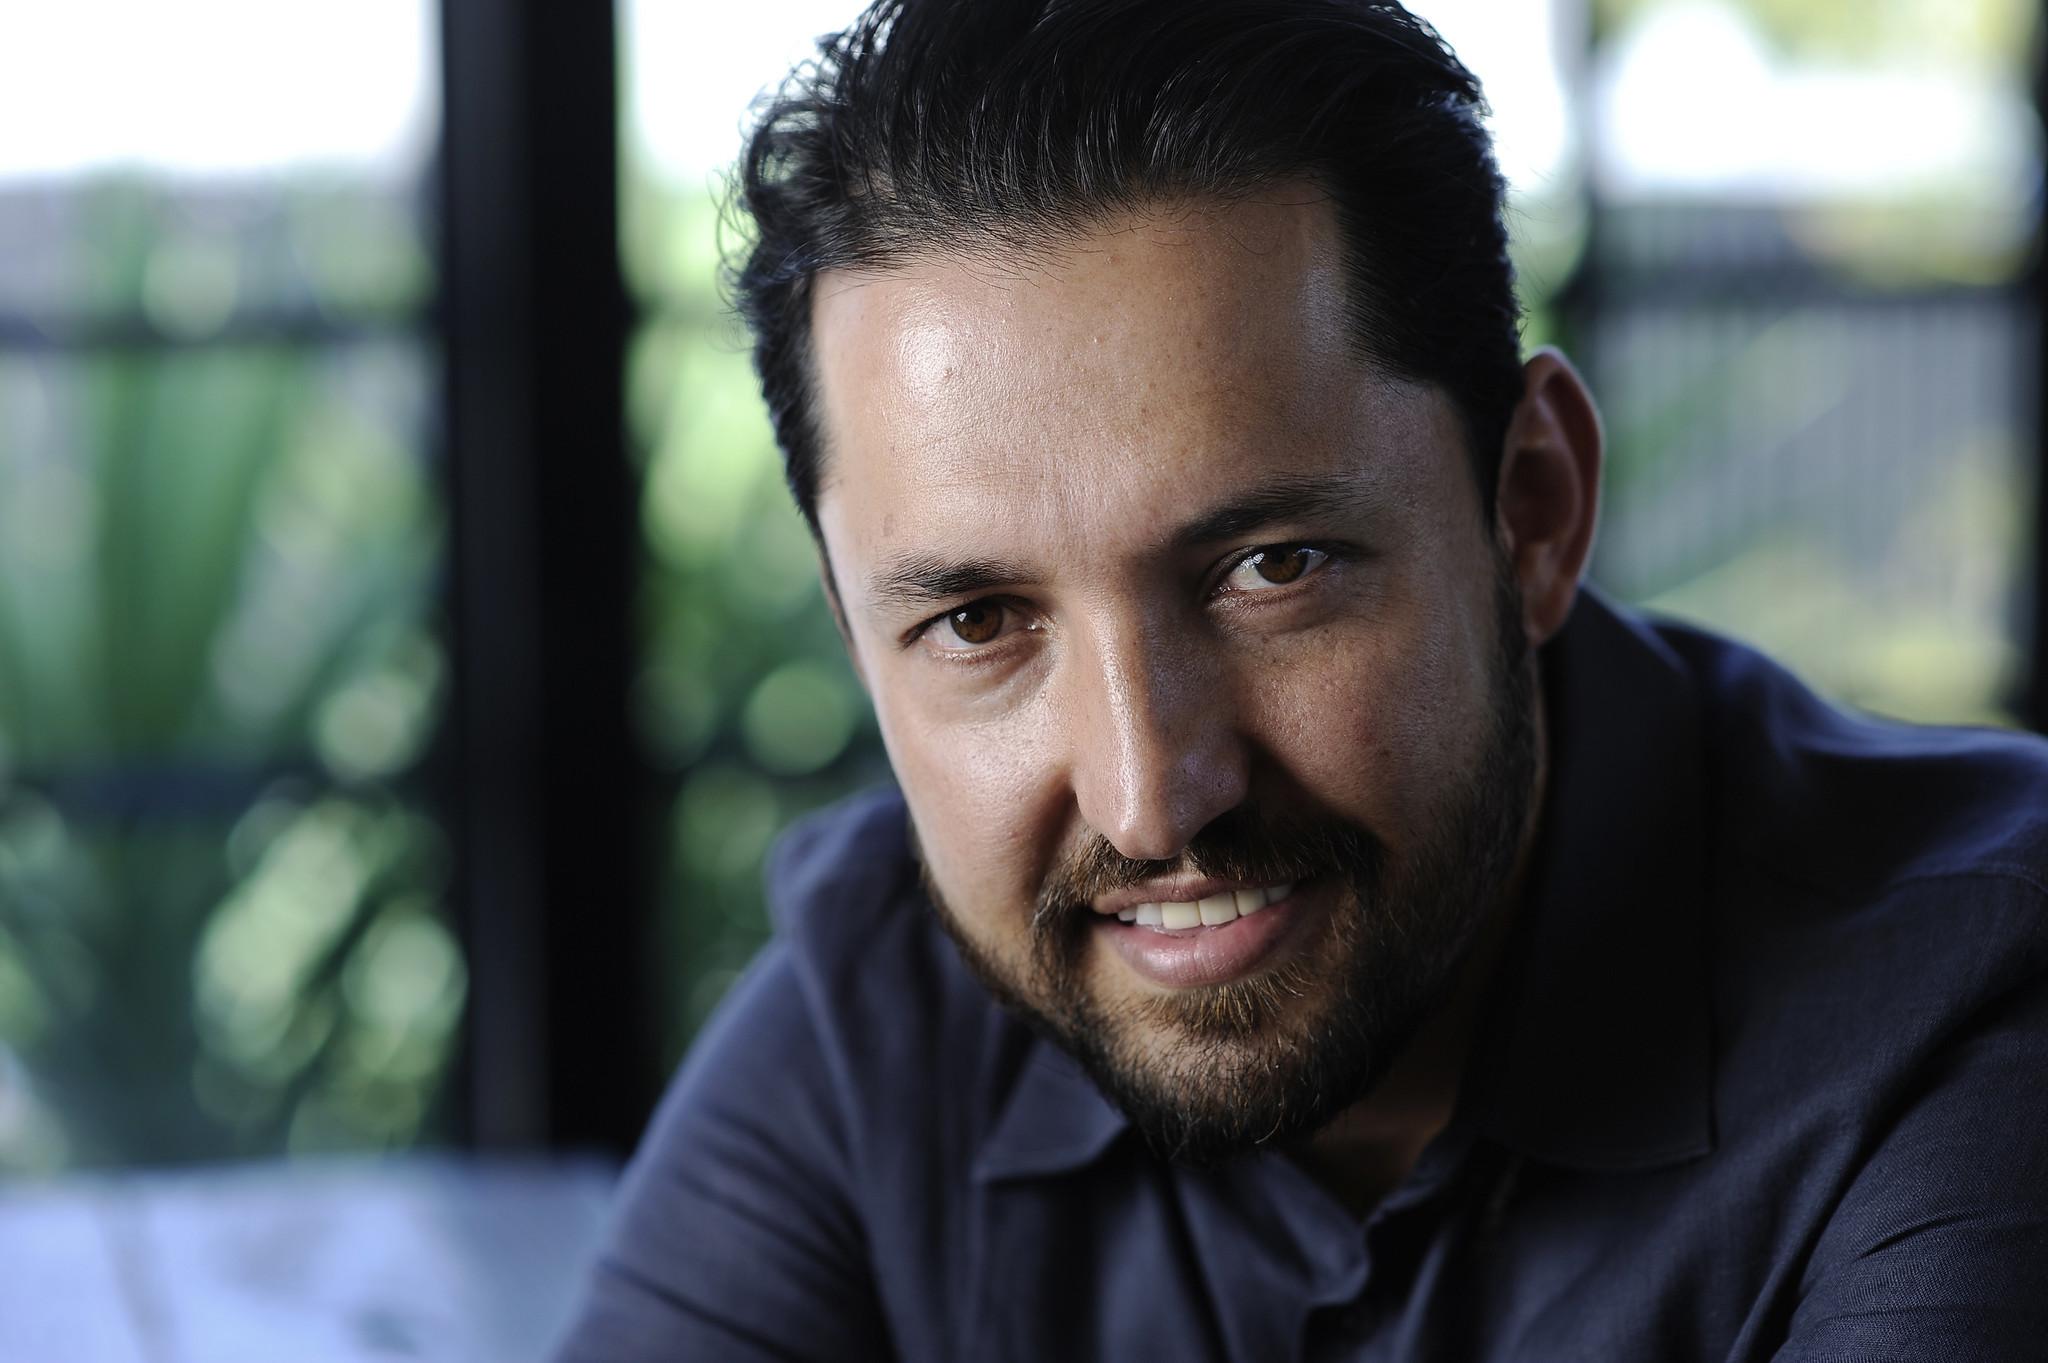 Estras Ochoa is chef and owner of Salazar.